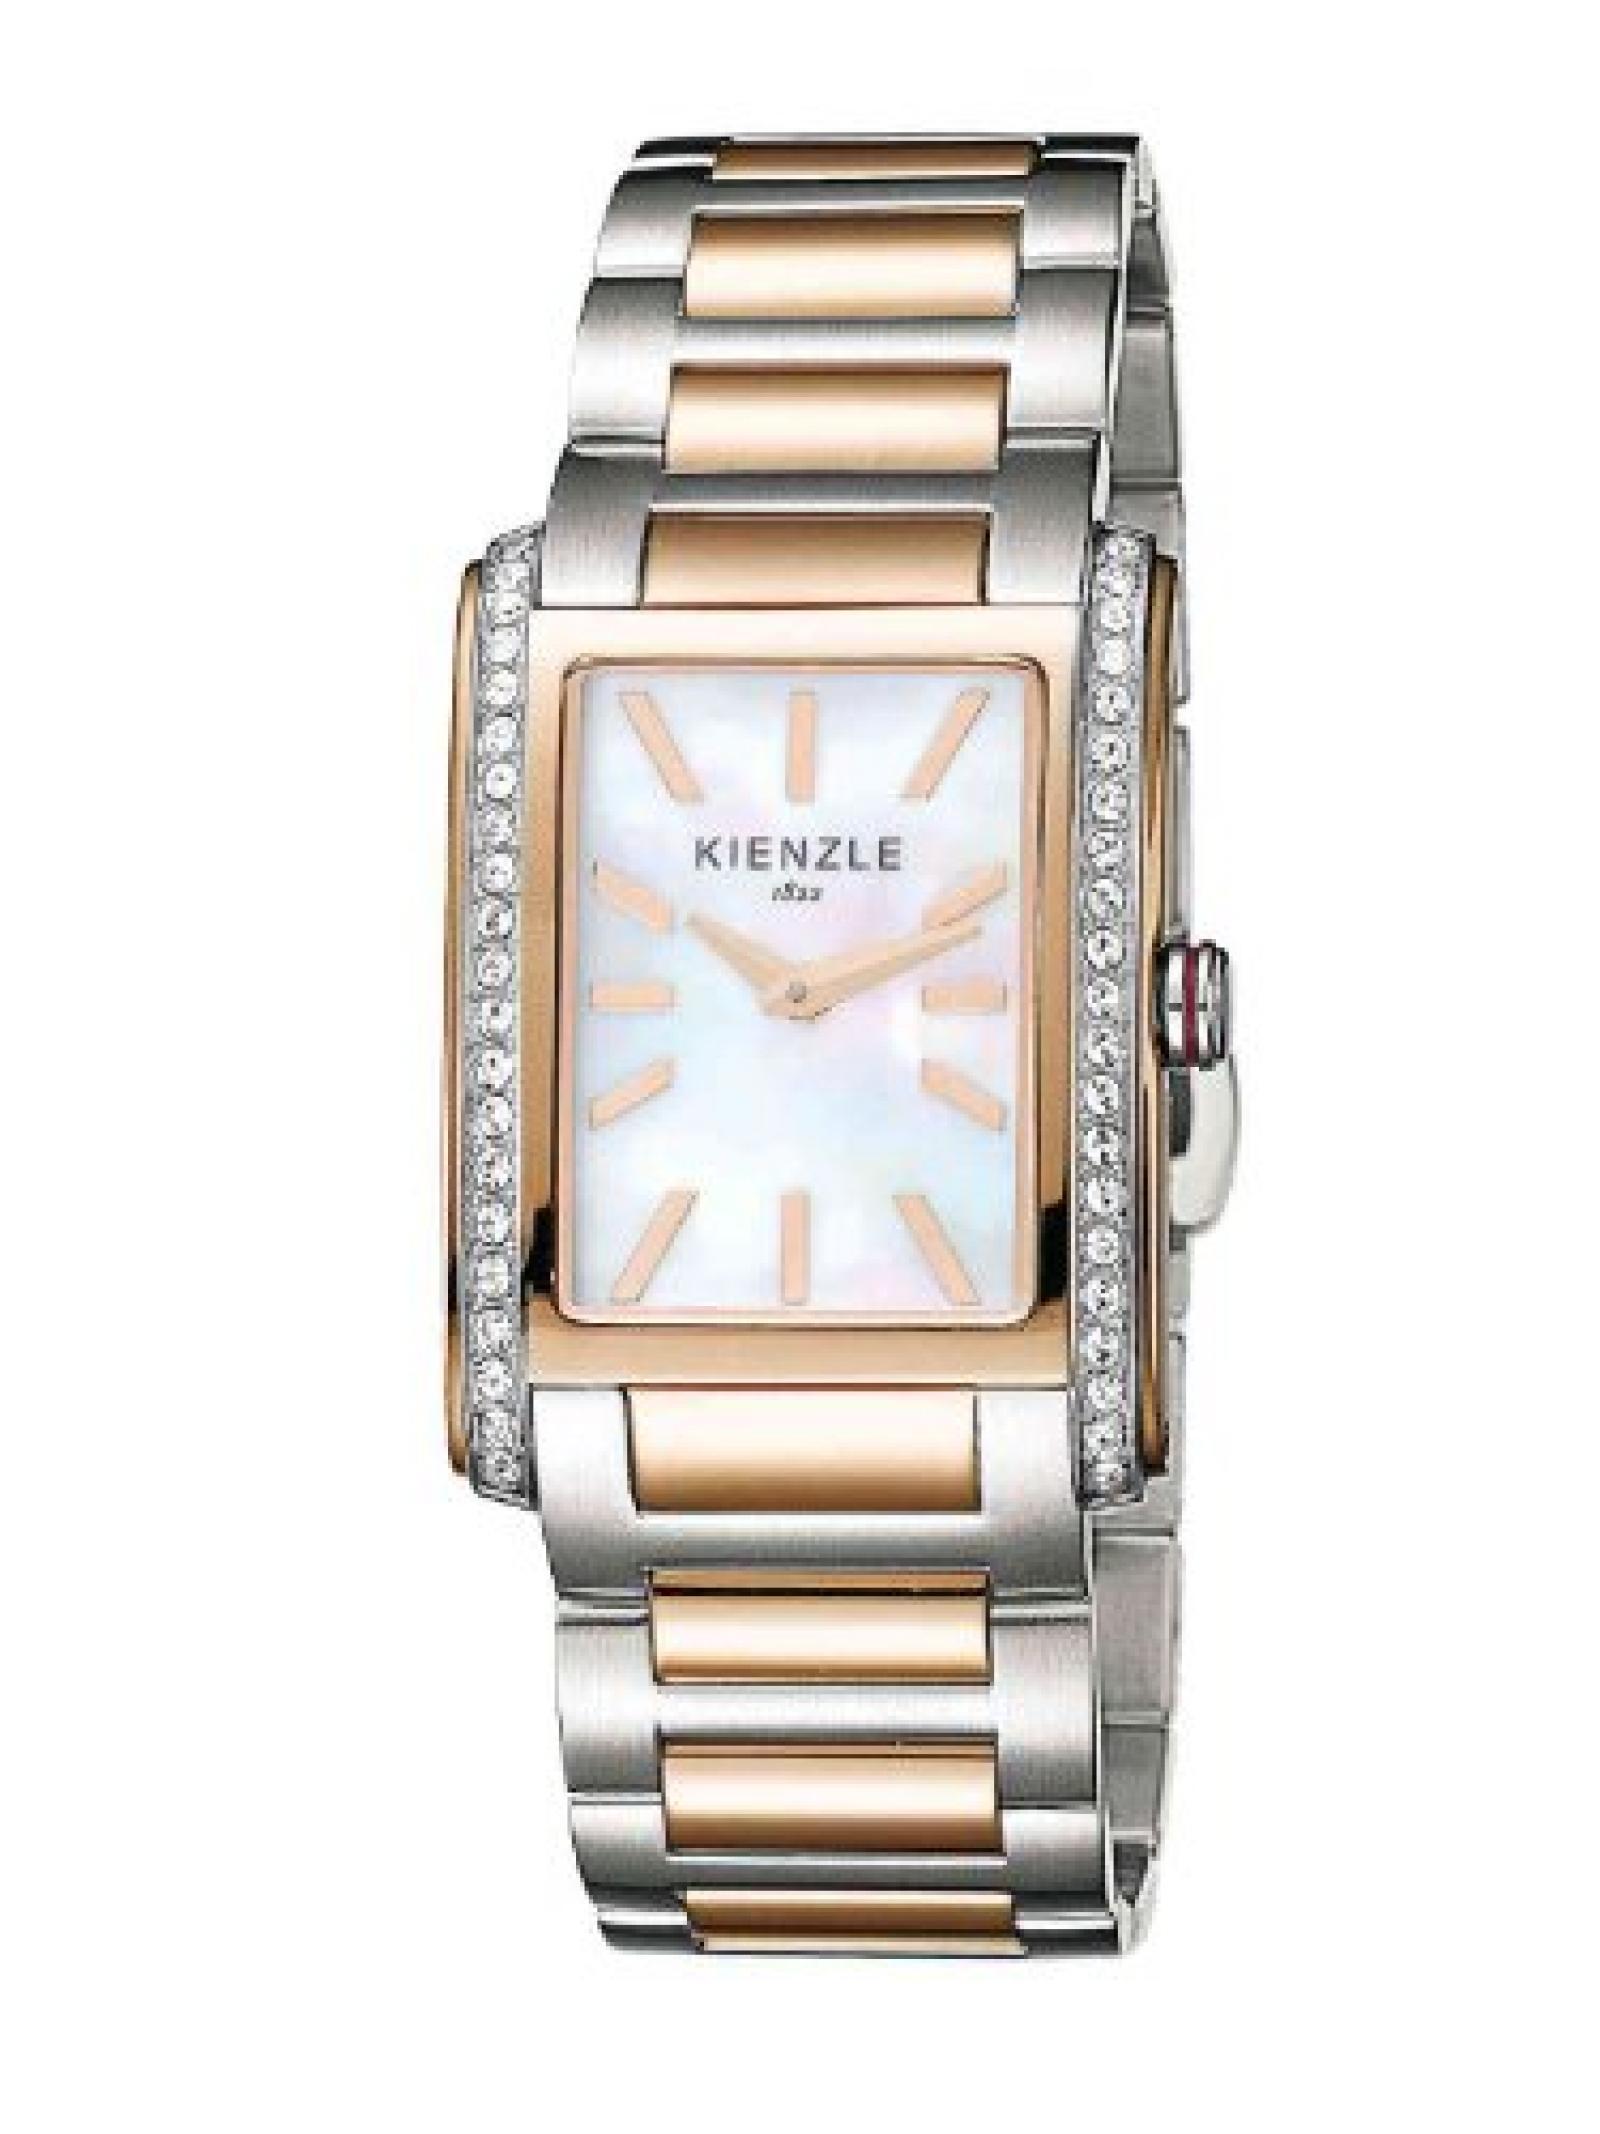 Kienzle Damen-Armbanduhr Analog Edelstahl beschichtet K5072114042